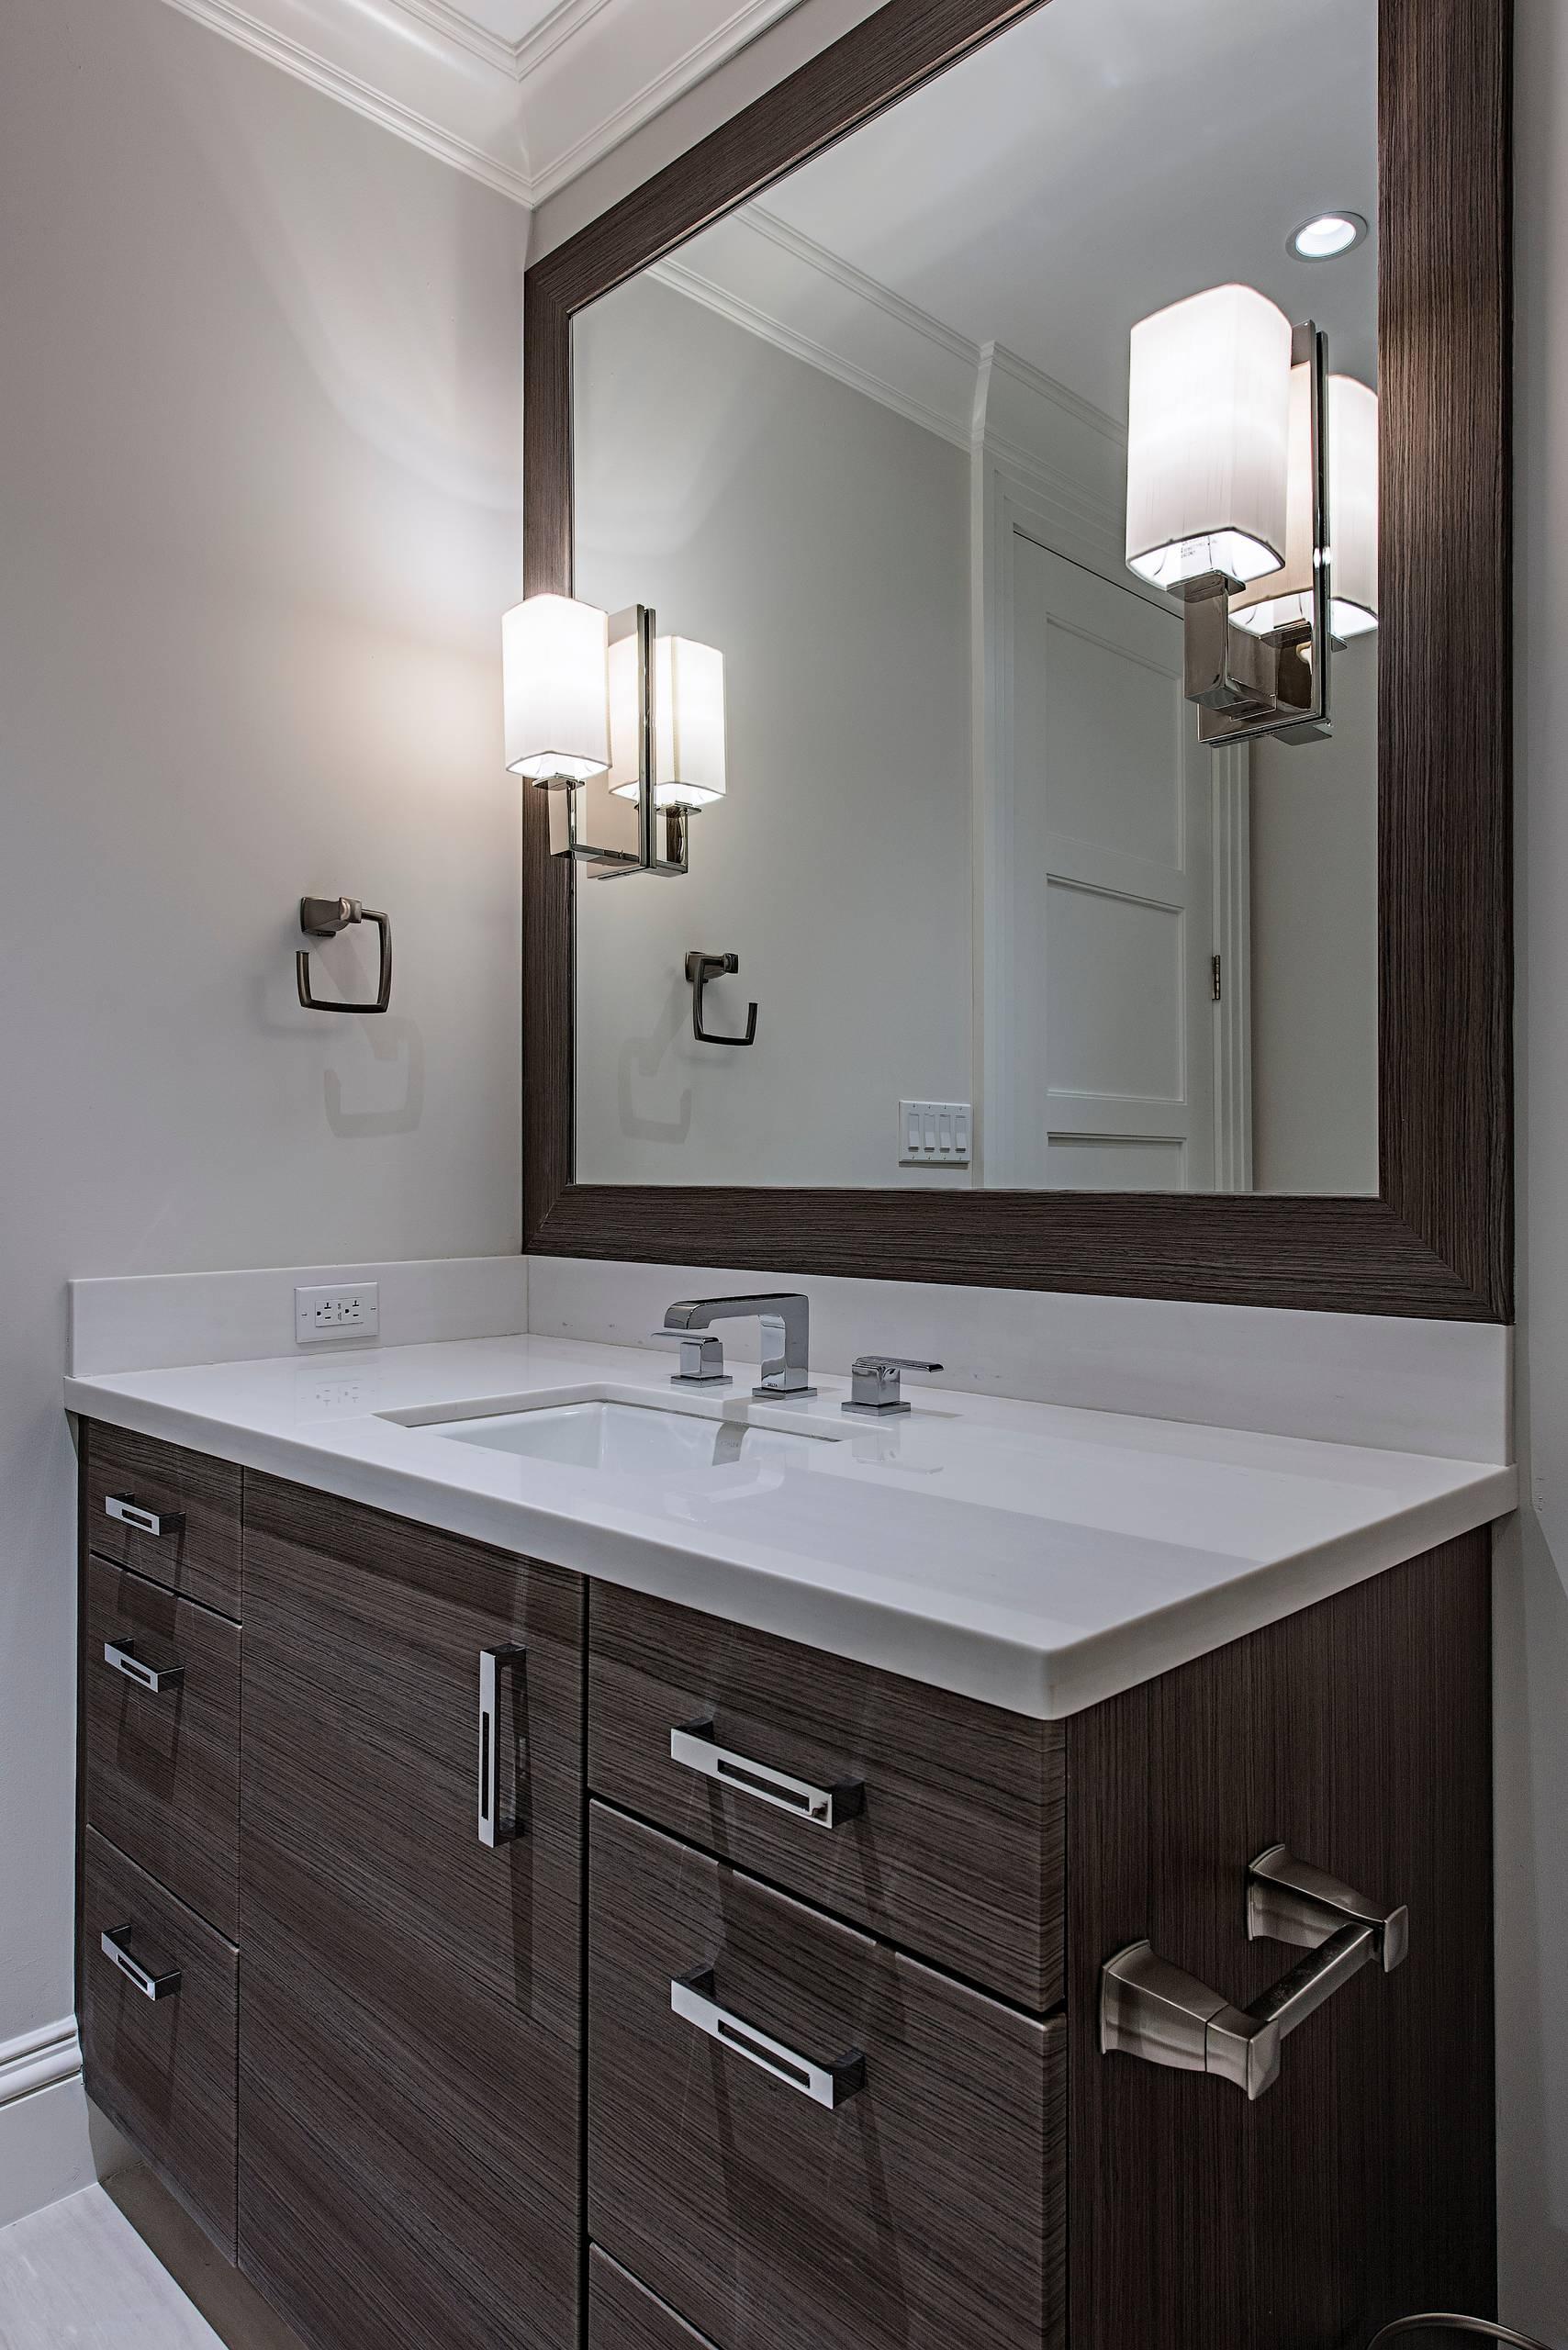 Certified Luxury Builders - 41 West - Waterfront Home Remodel